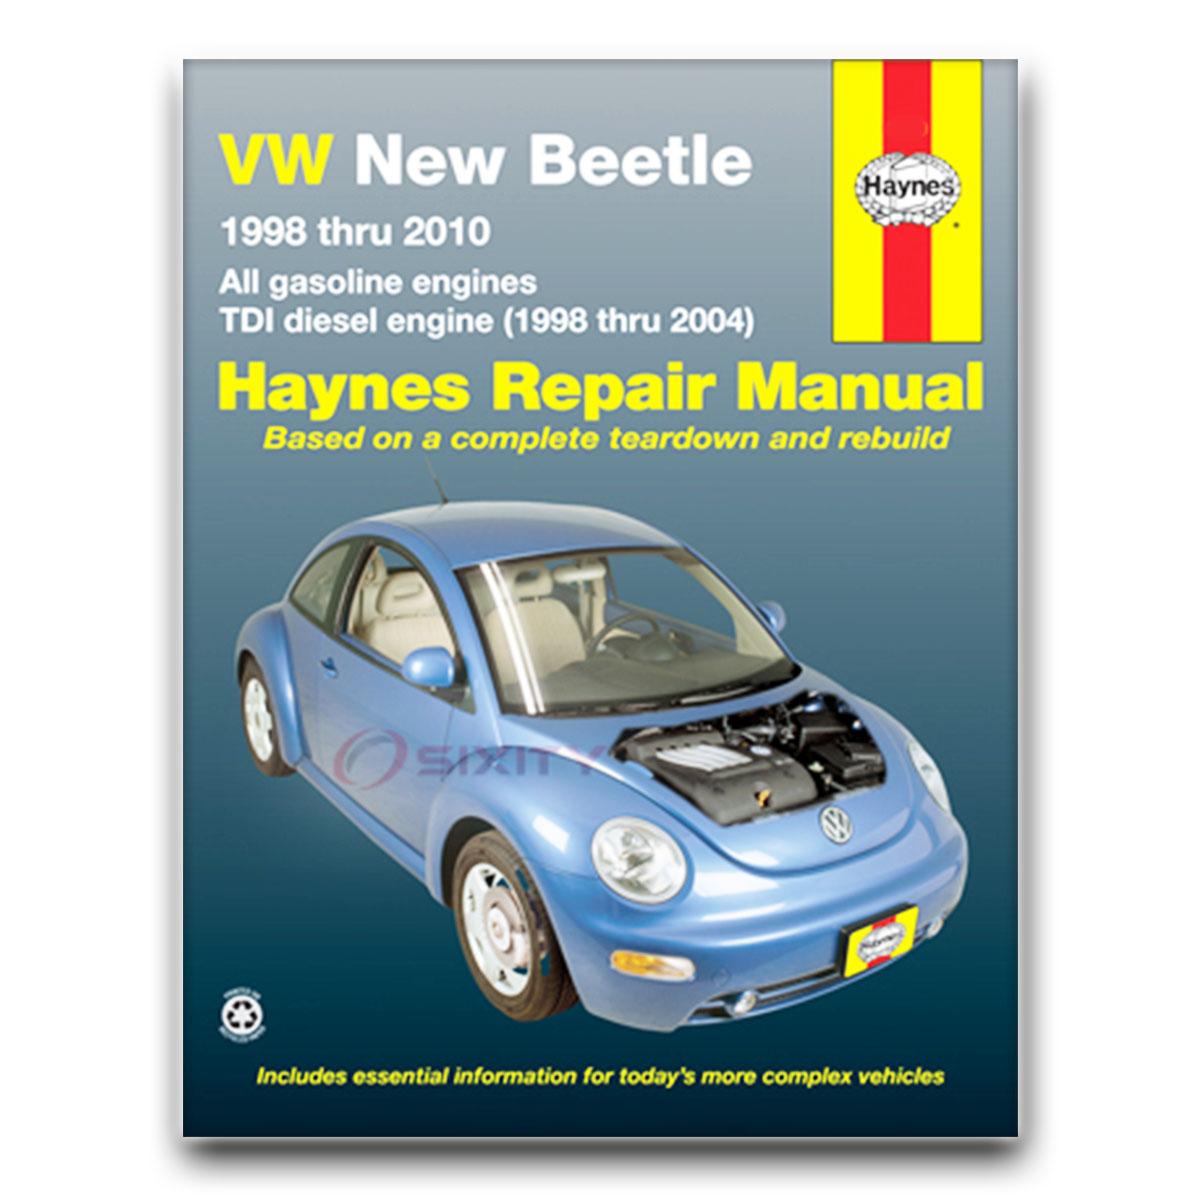 volkswagen vw beetle haynes repair manual base 2 5 glx sport turbo rh ebay com Replacing Climate Control Backlight 2004 Beetle 2004 Beetle Turbo S